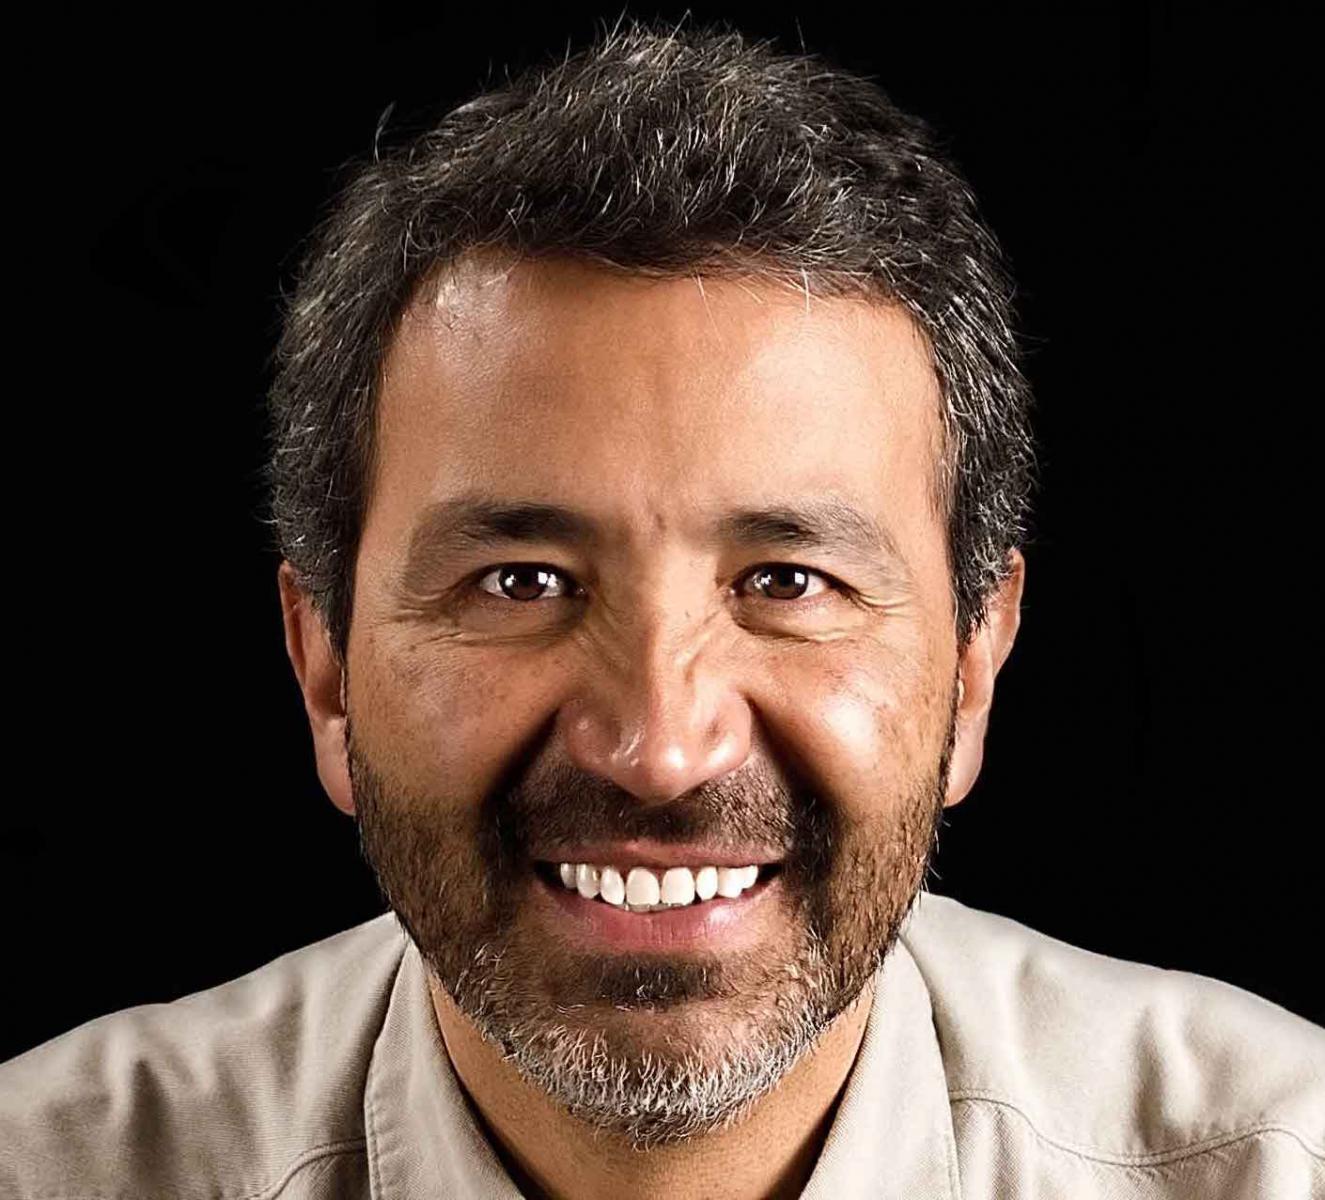 Photo of Luis Martinez-Lemus, Ph.D.